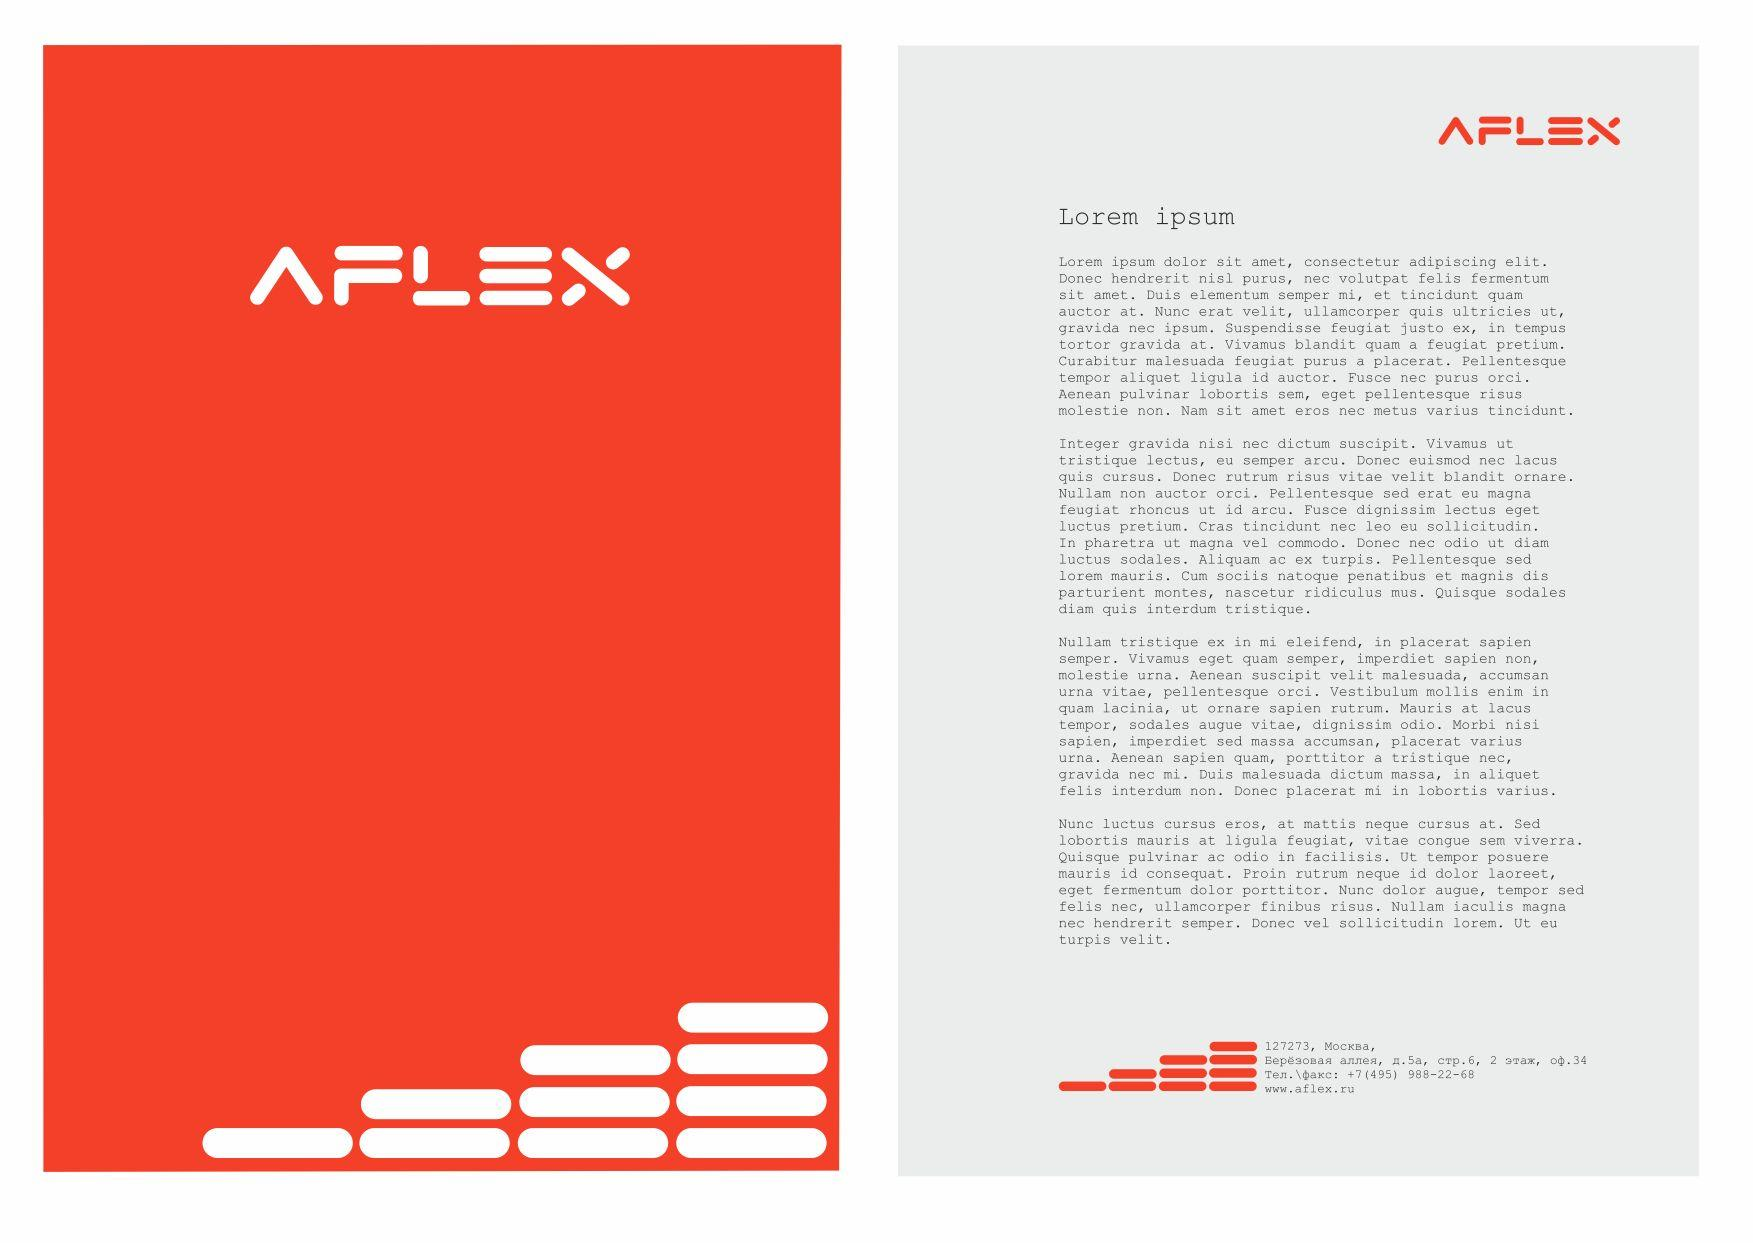 AFLEX-4